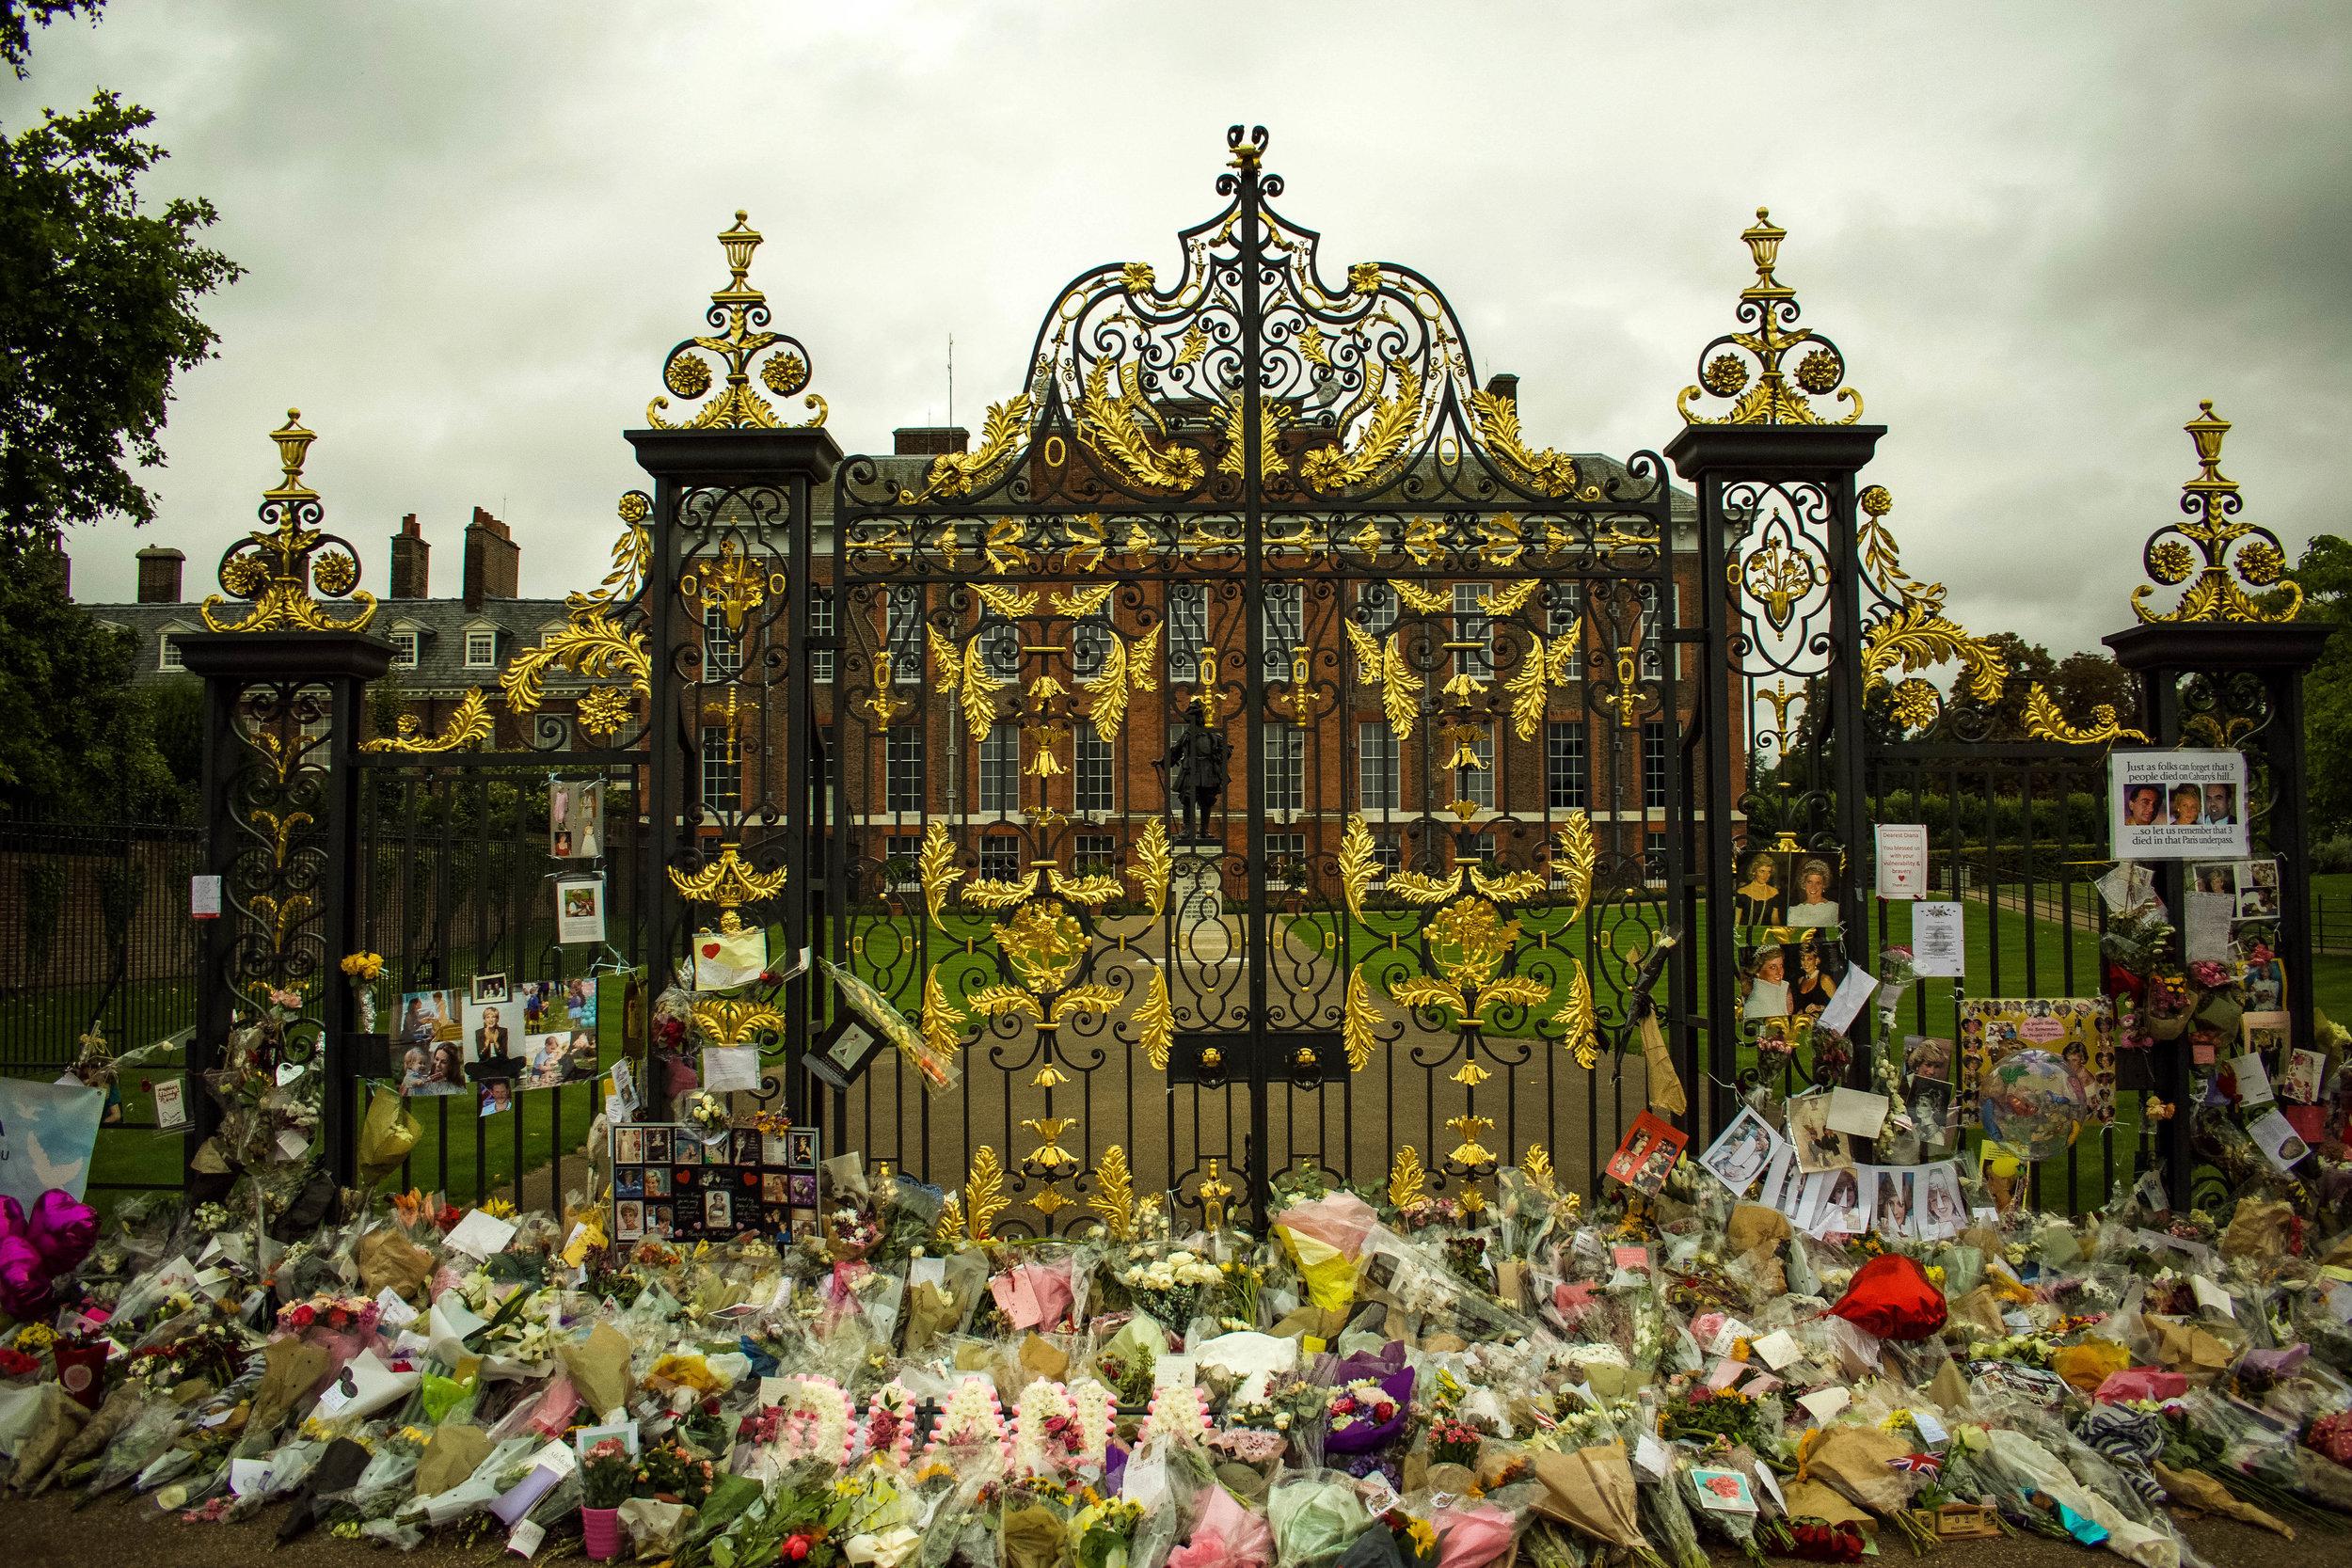 Kensington Palace ~ London